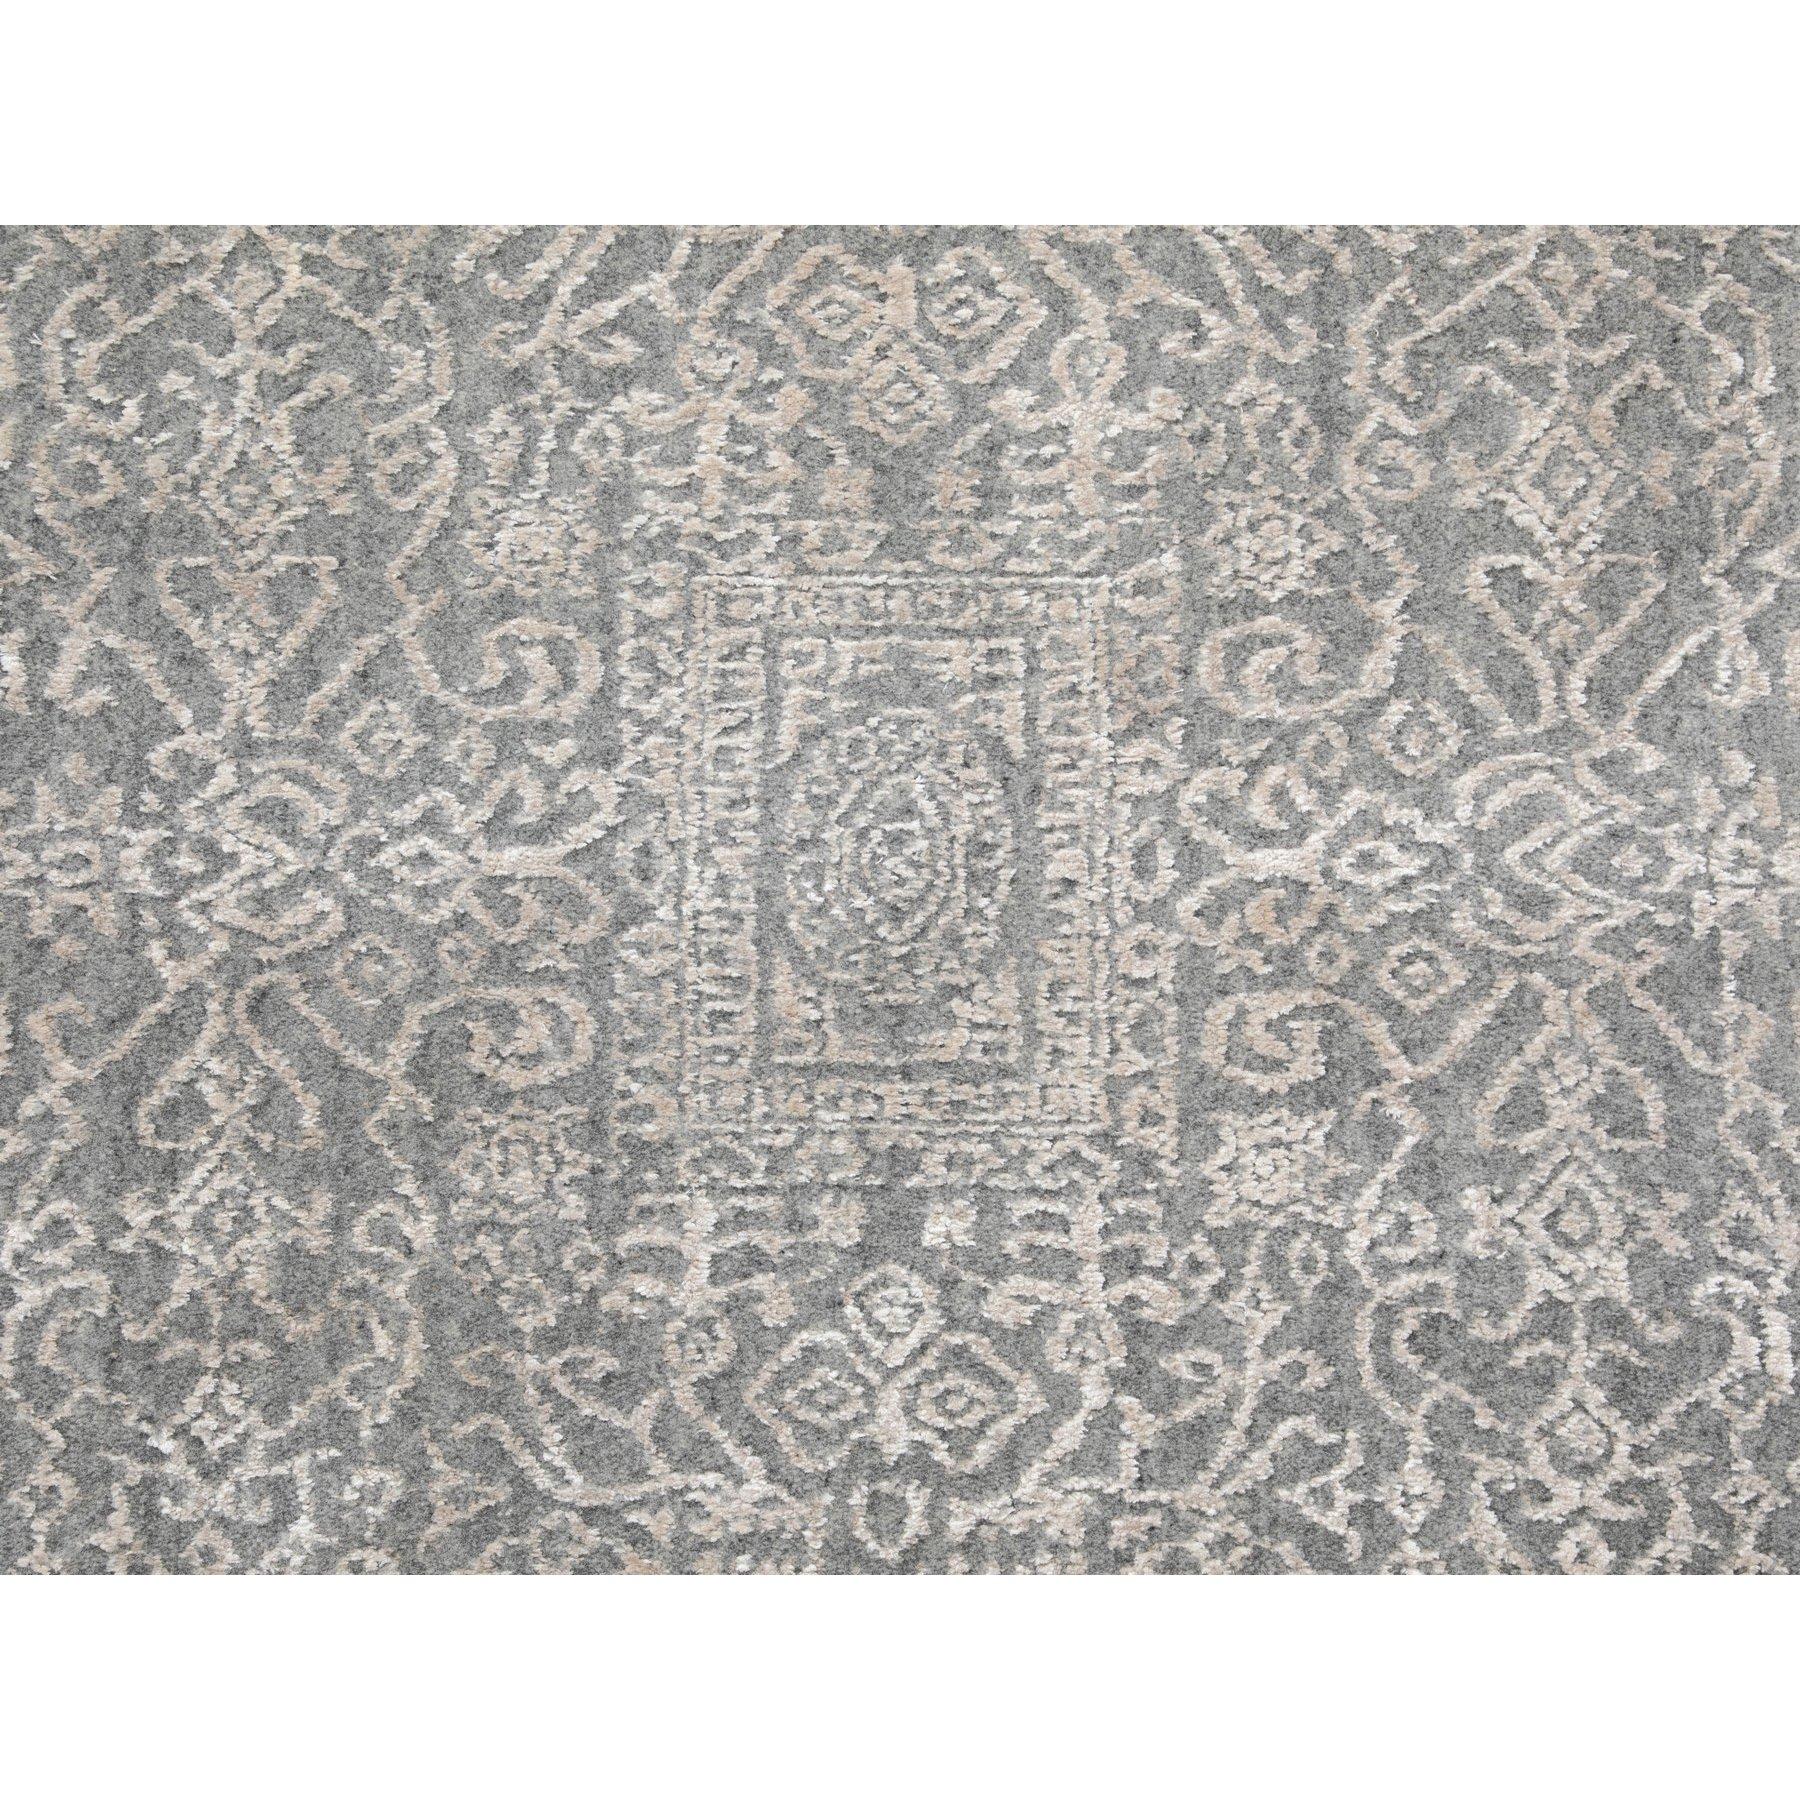 "5'10""x9'1"" Gray Fine jacquard Hand Loomed Modern Wool And Art Silk Oriental Rug"